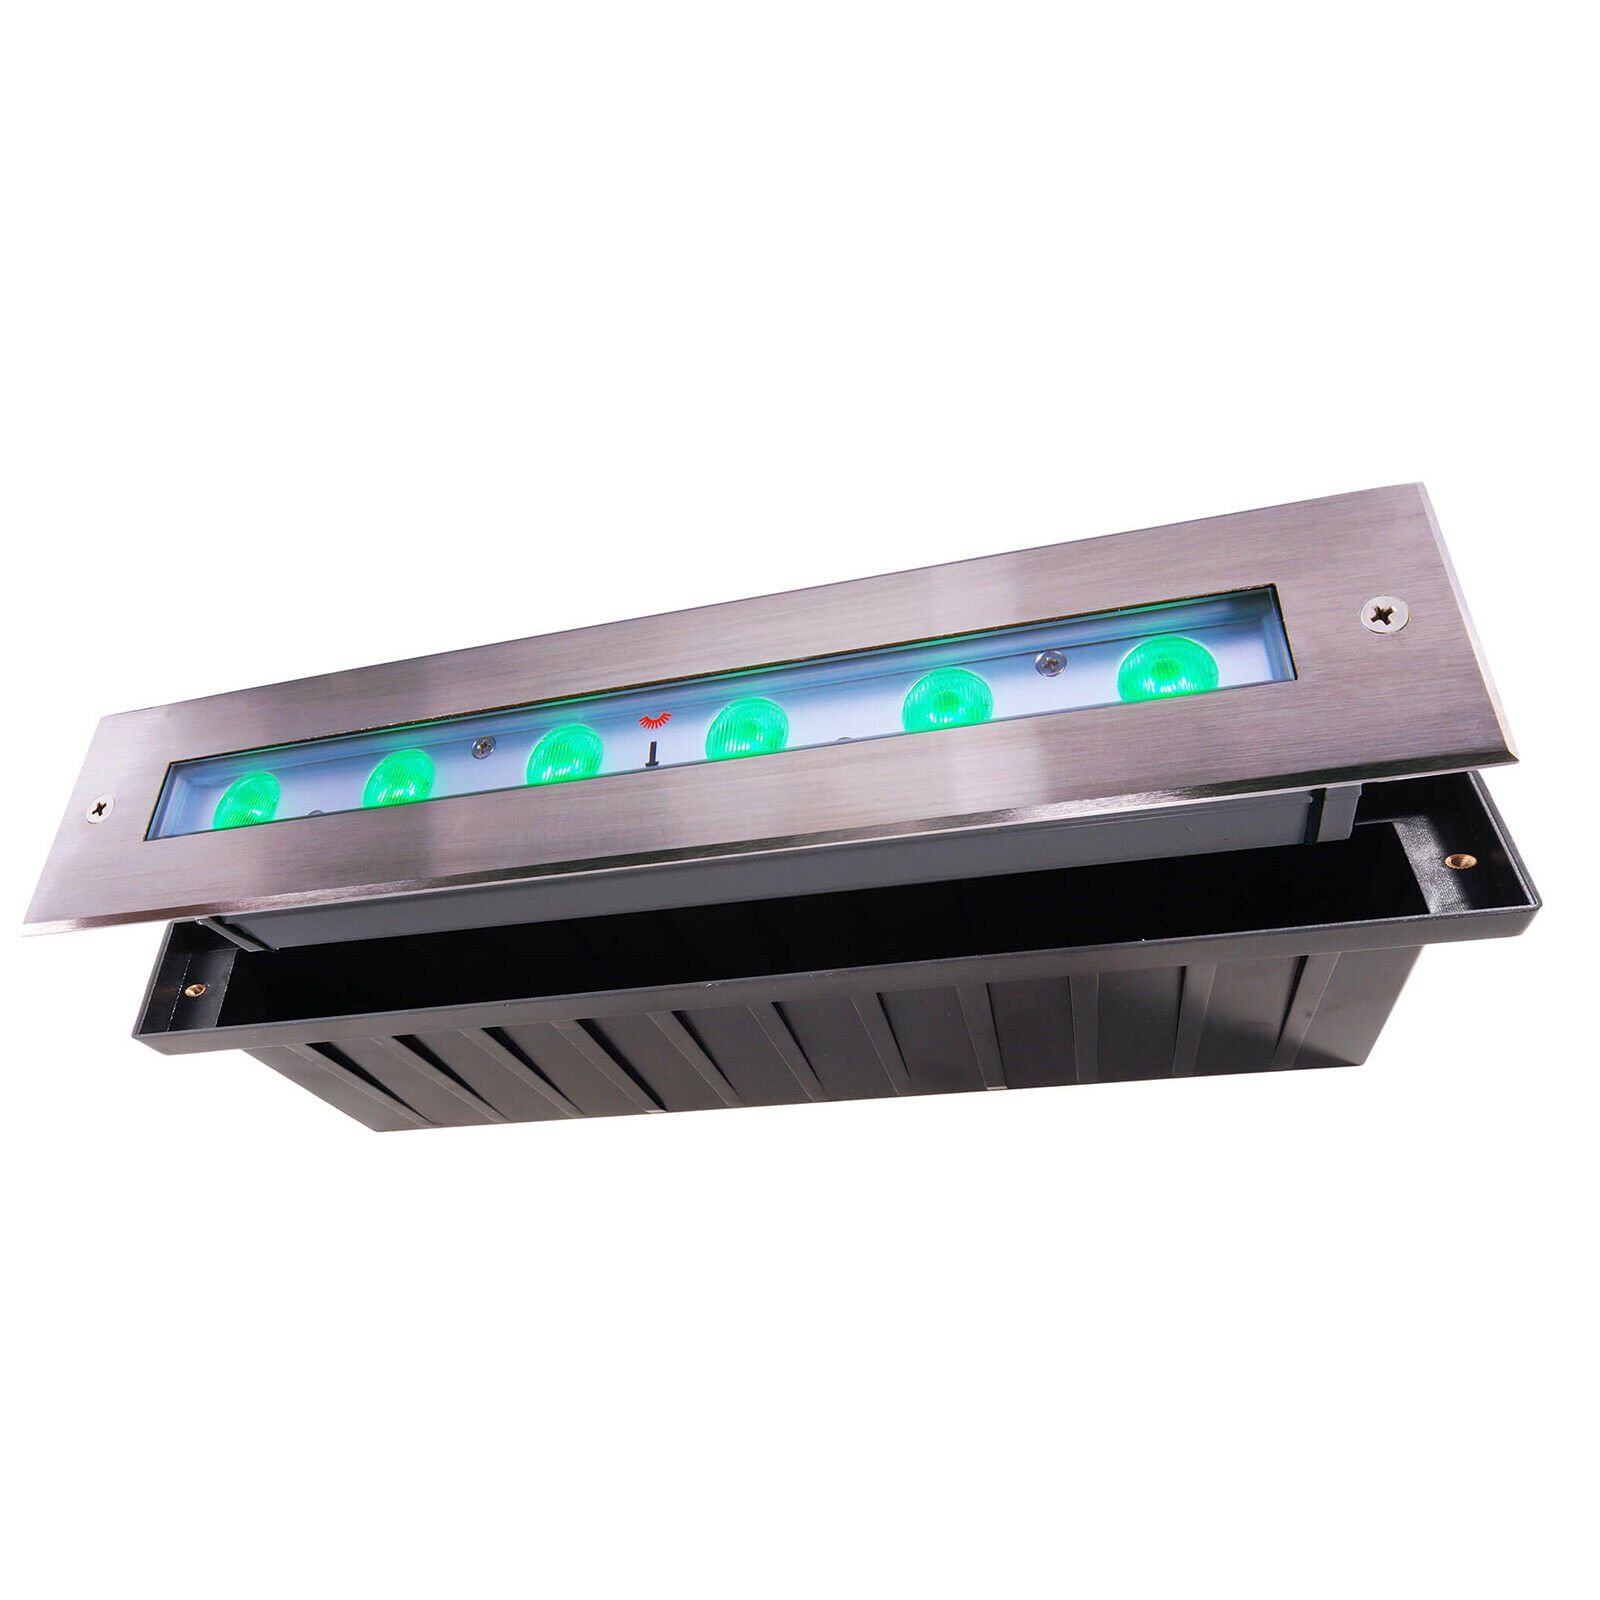 Begehbar IP67 led spot light 17w full Farbe rgb 24v dmx Optik Asymmetrisch